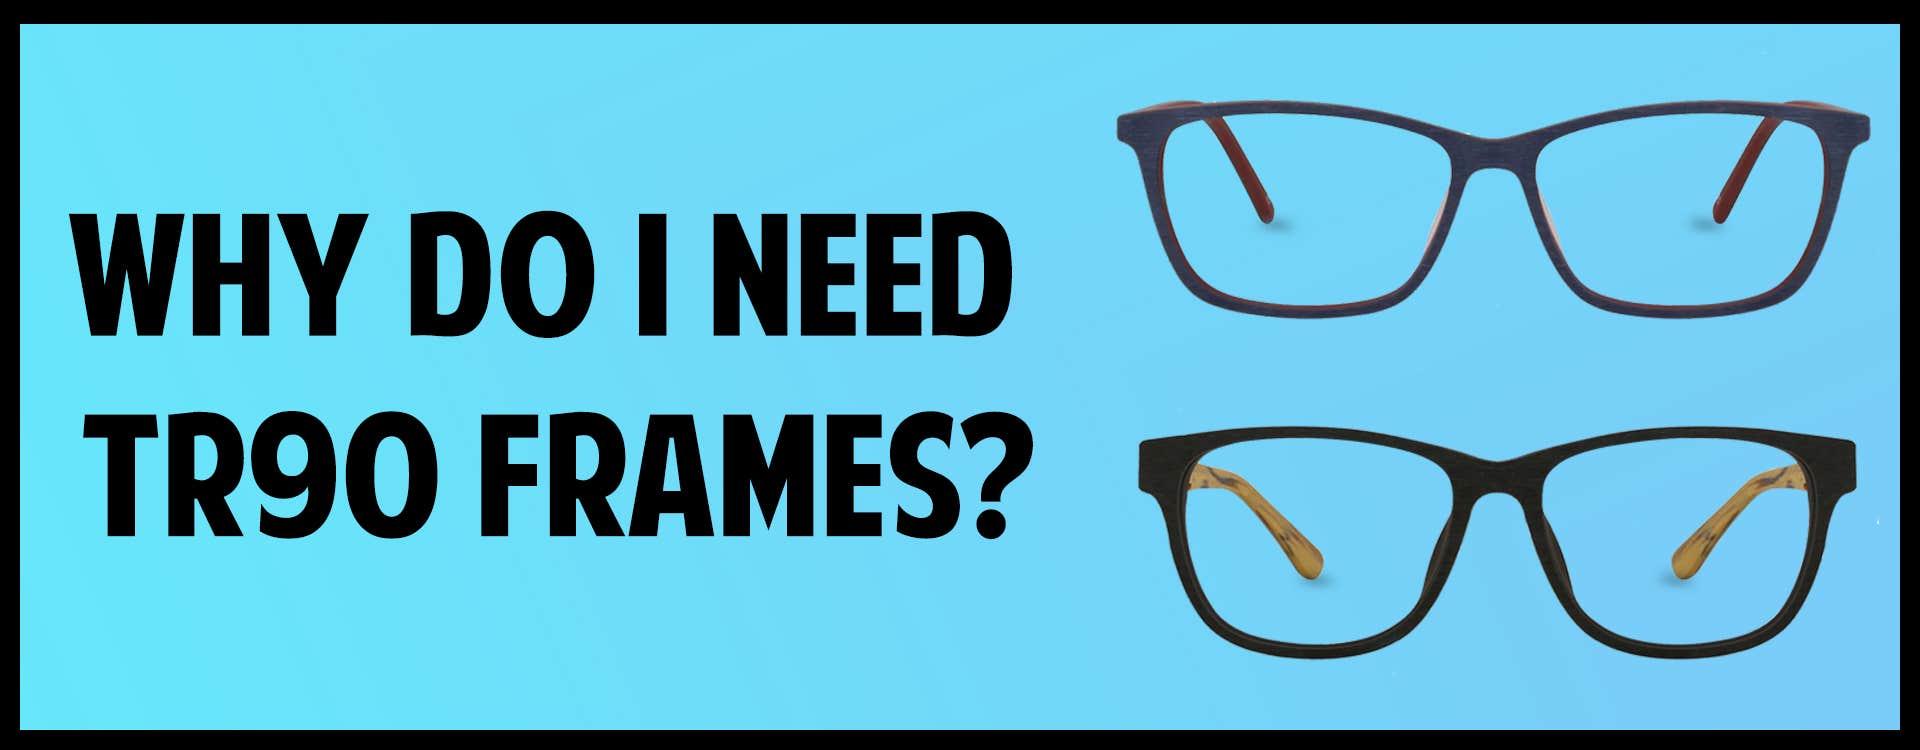 Why do I need a TR90 Frames